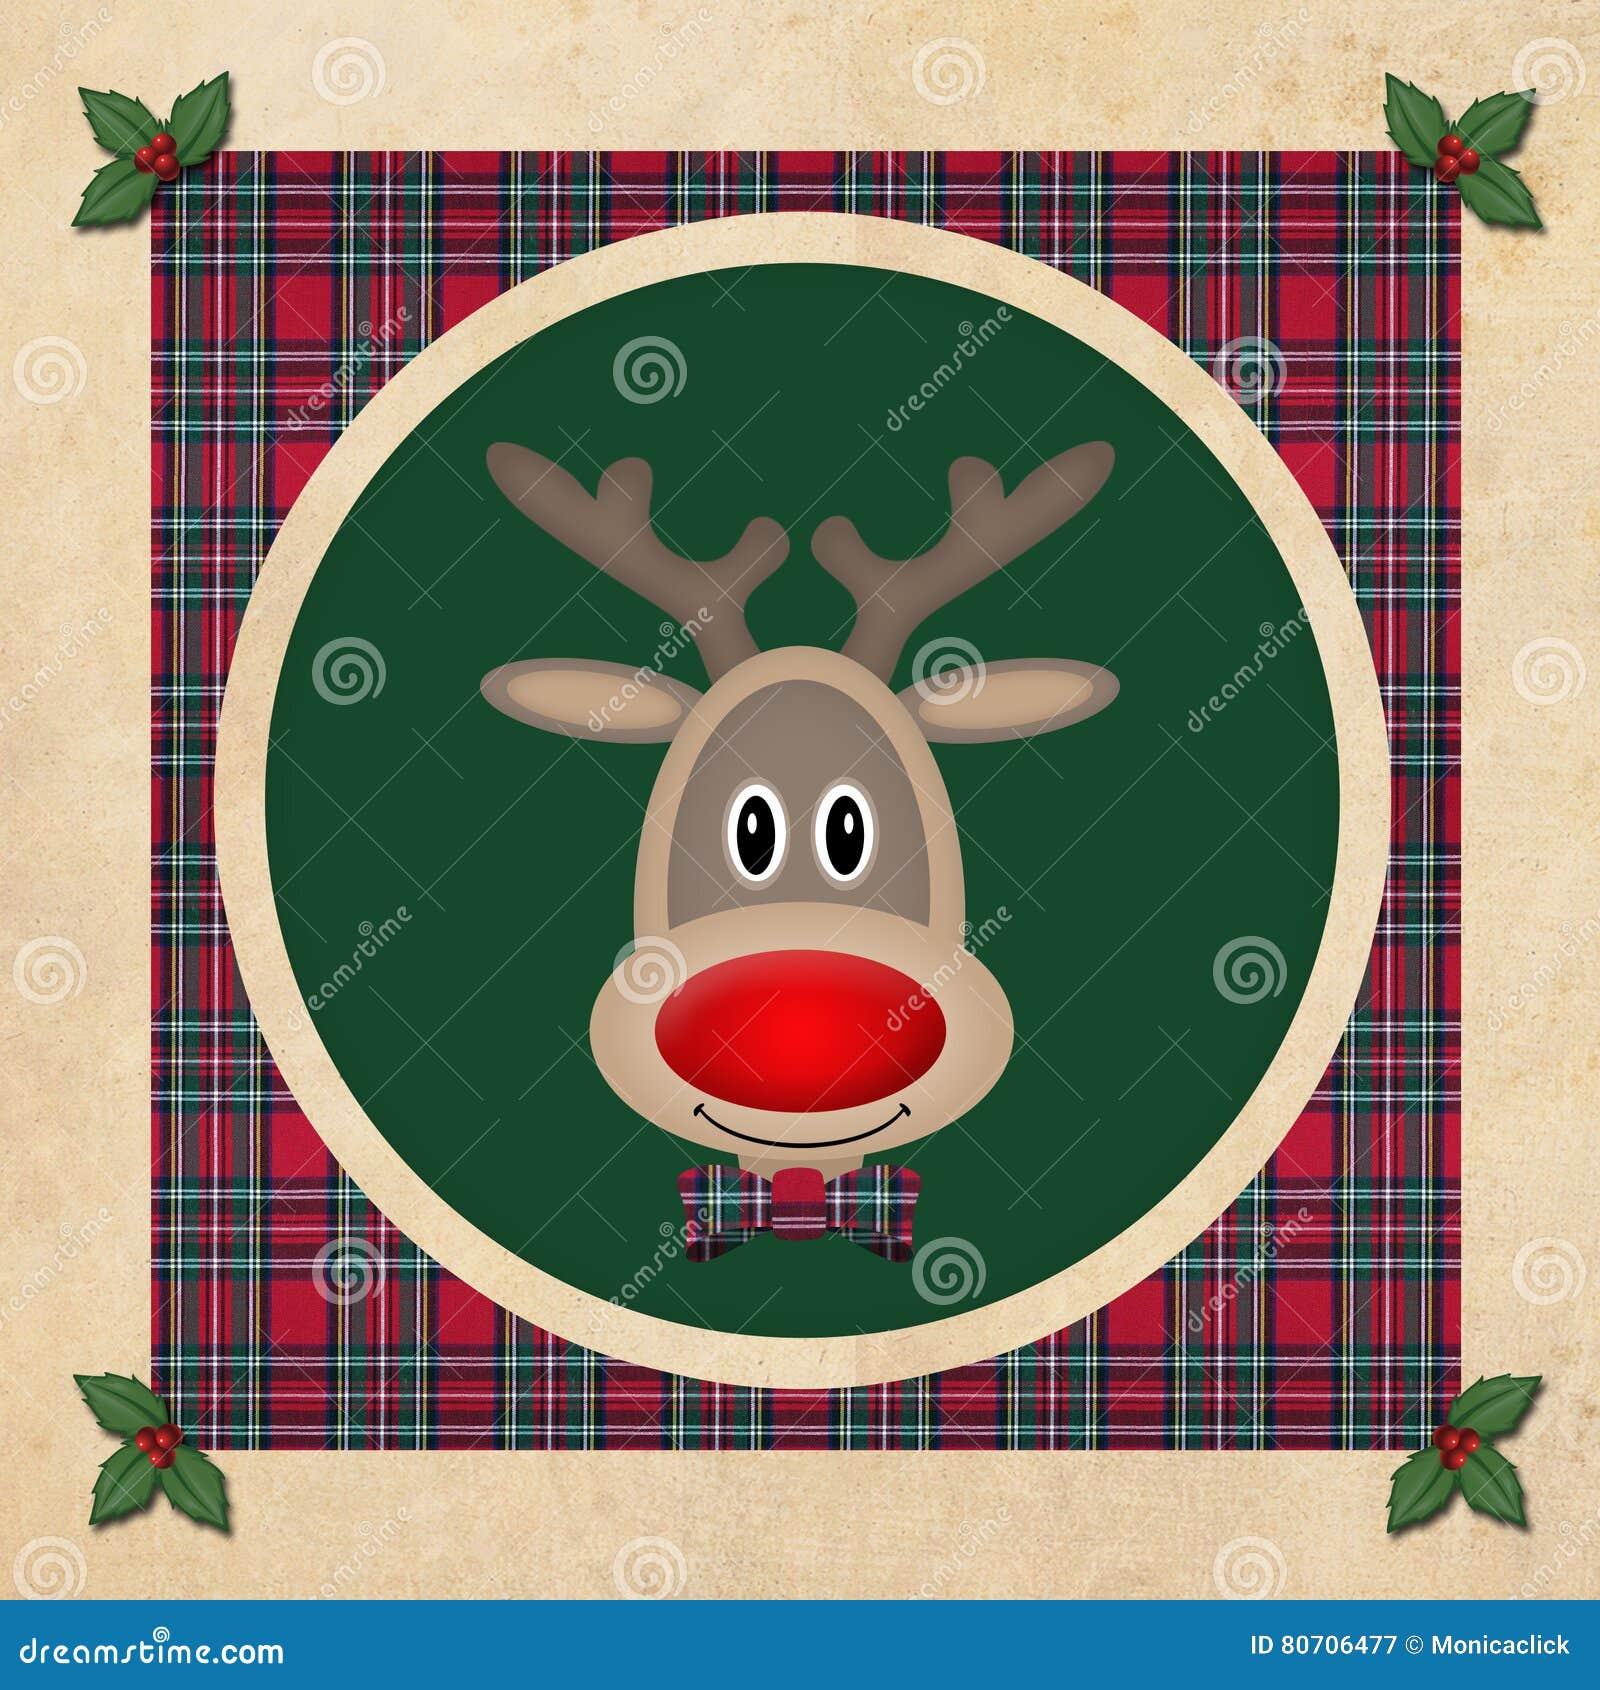 Leuk rendier in groene cirkel met rood plaidpatroon, op oude document achtergrond, het ontwerp van de Kerstmiskaart